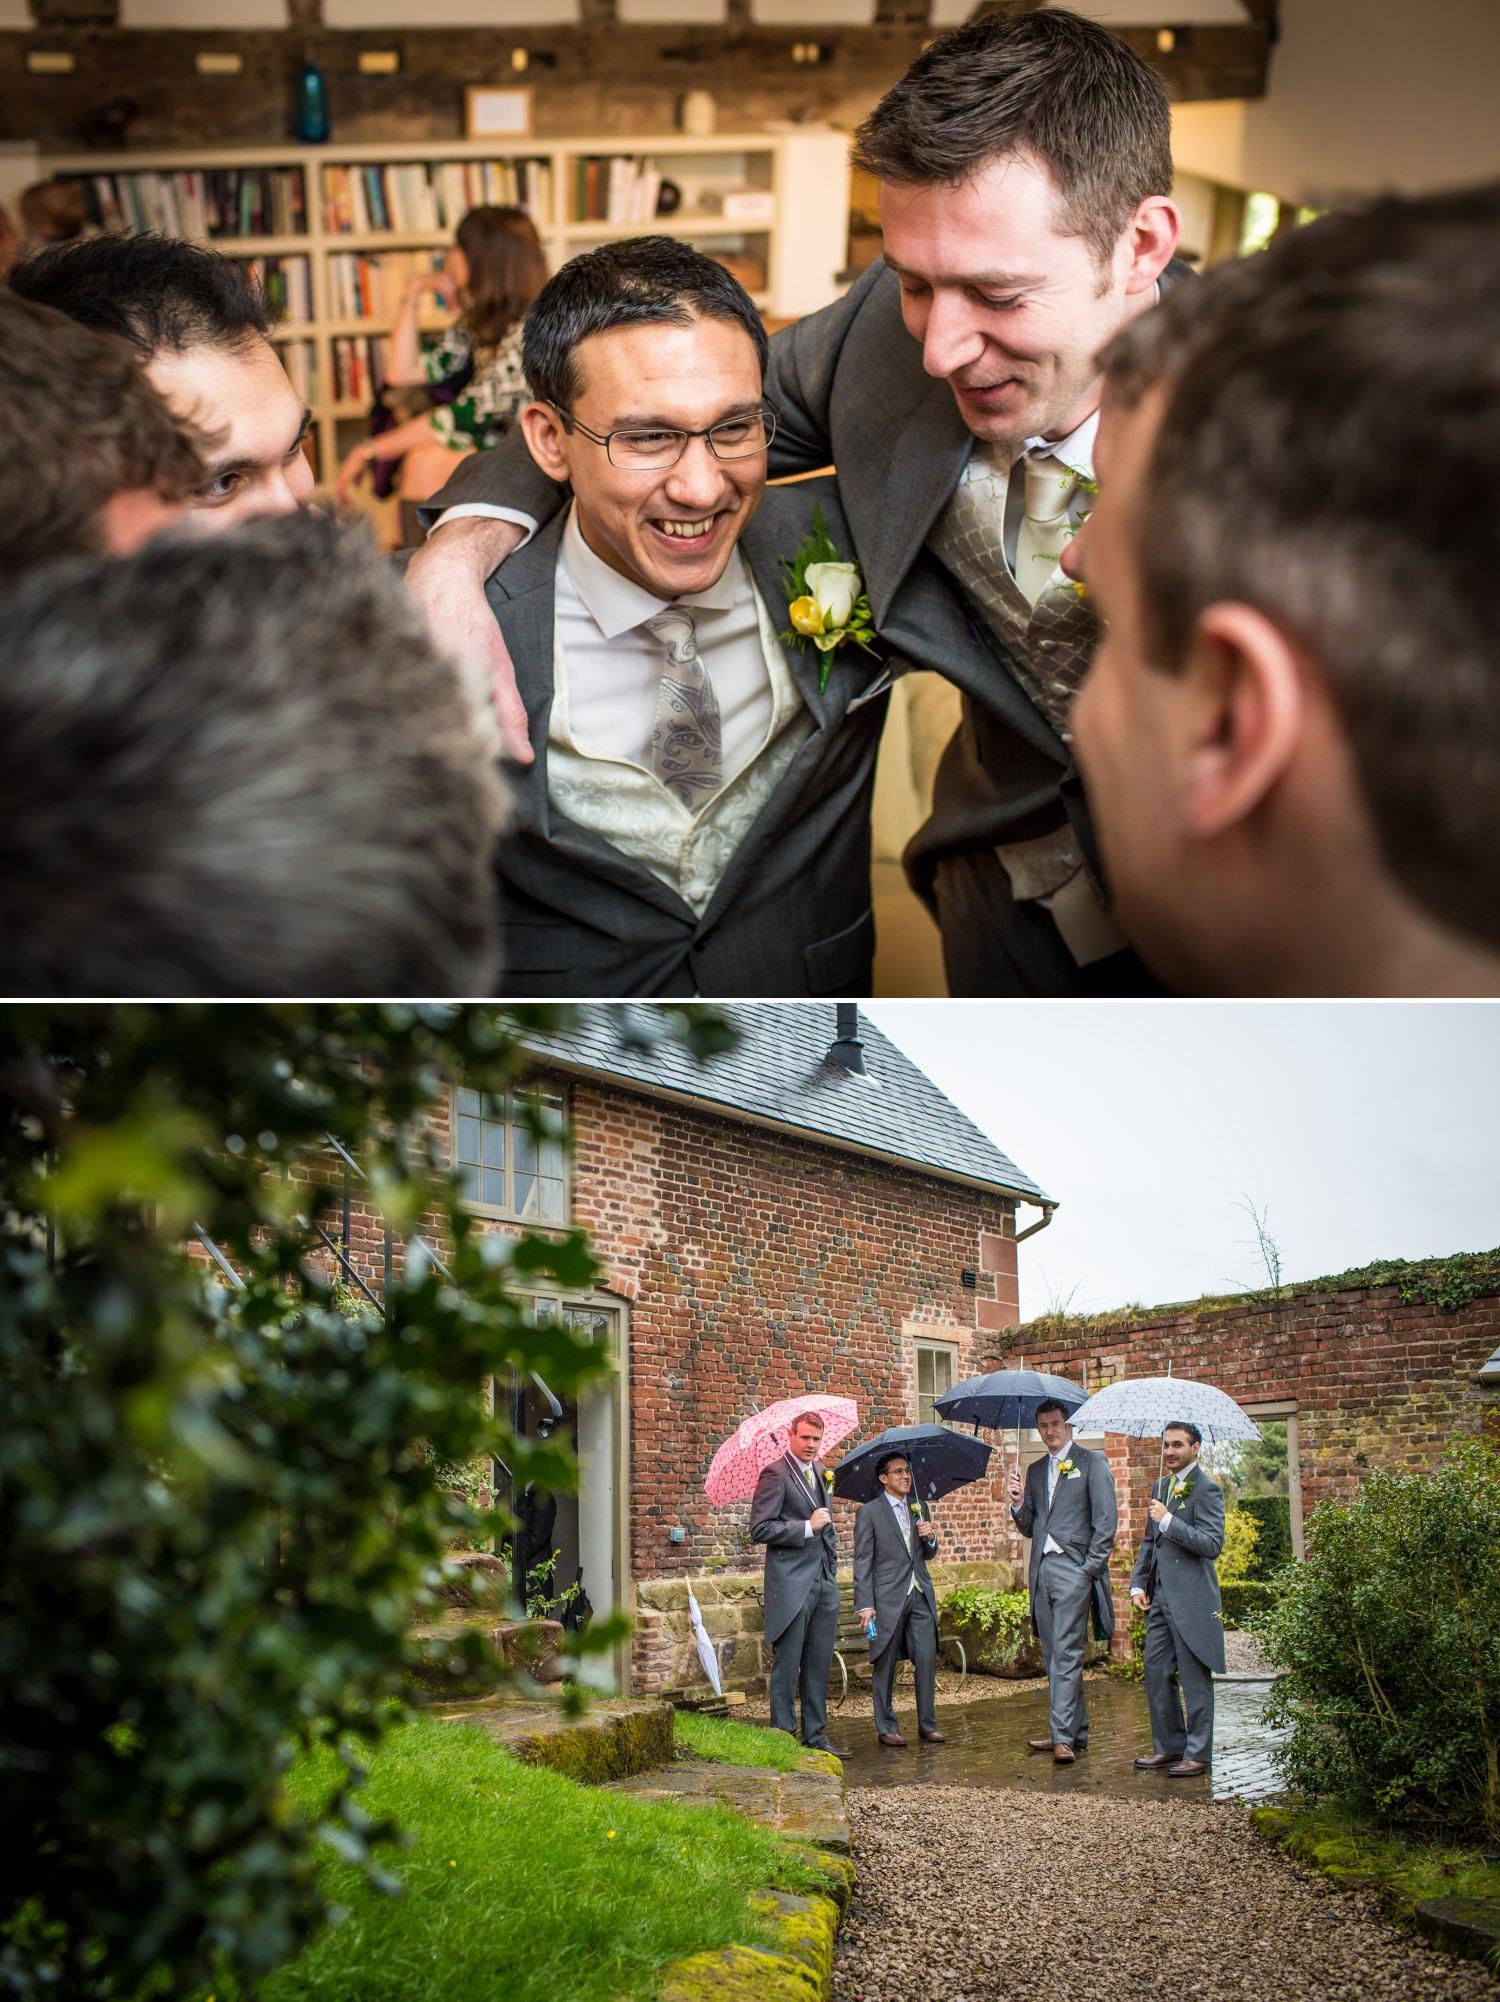 Wedding Photographer Pimhill Barn, Shropshire